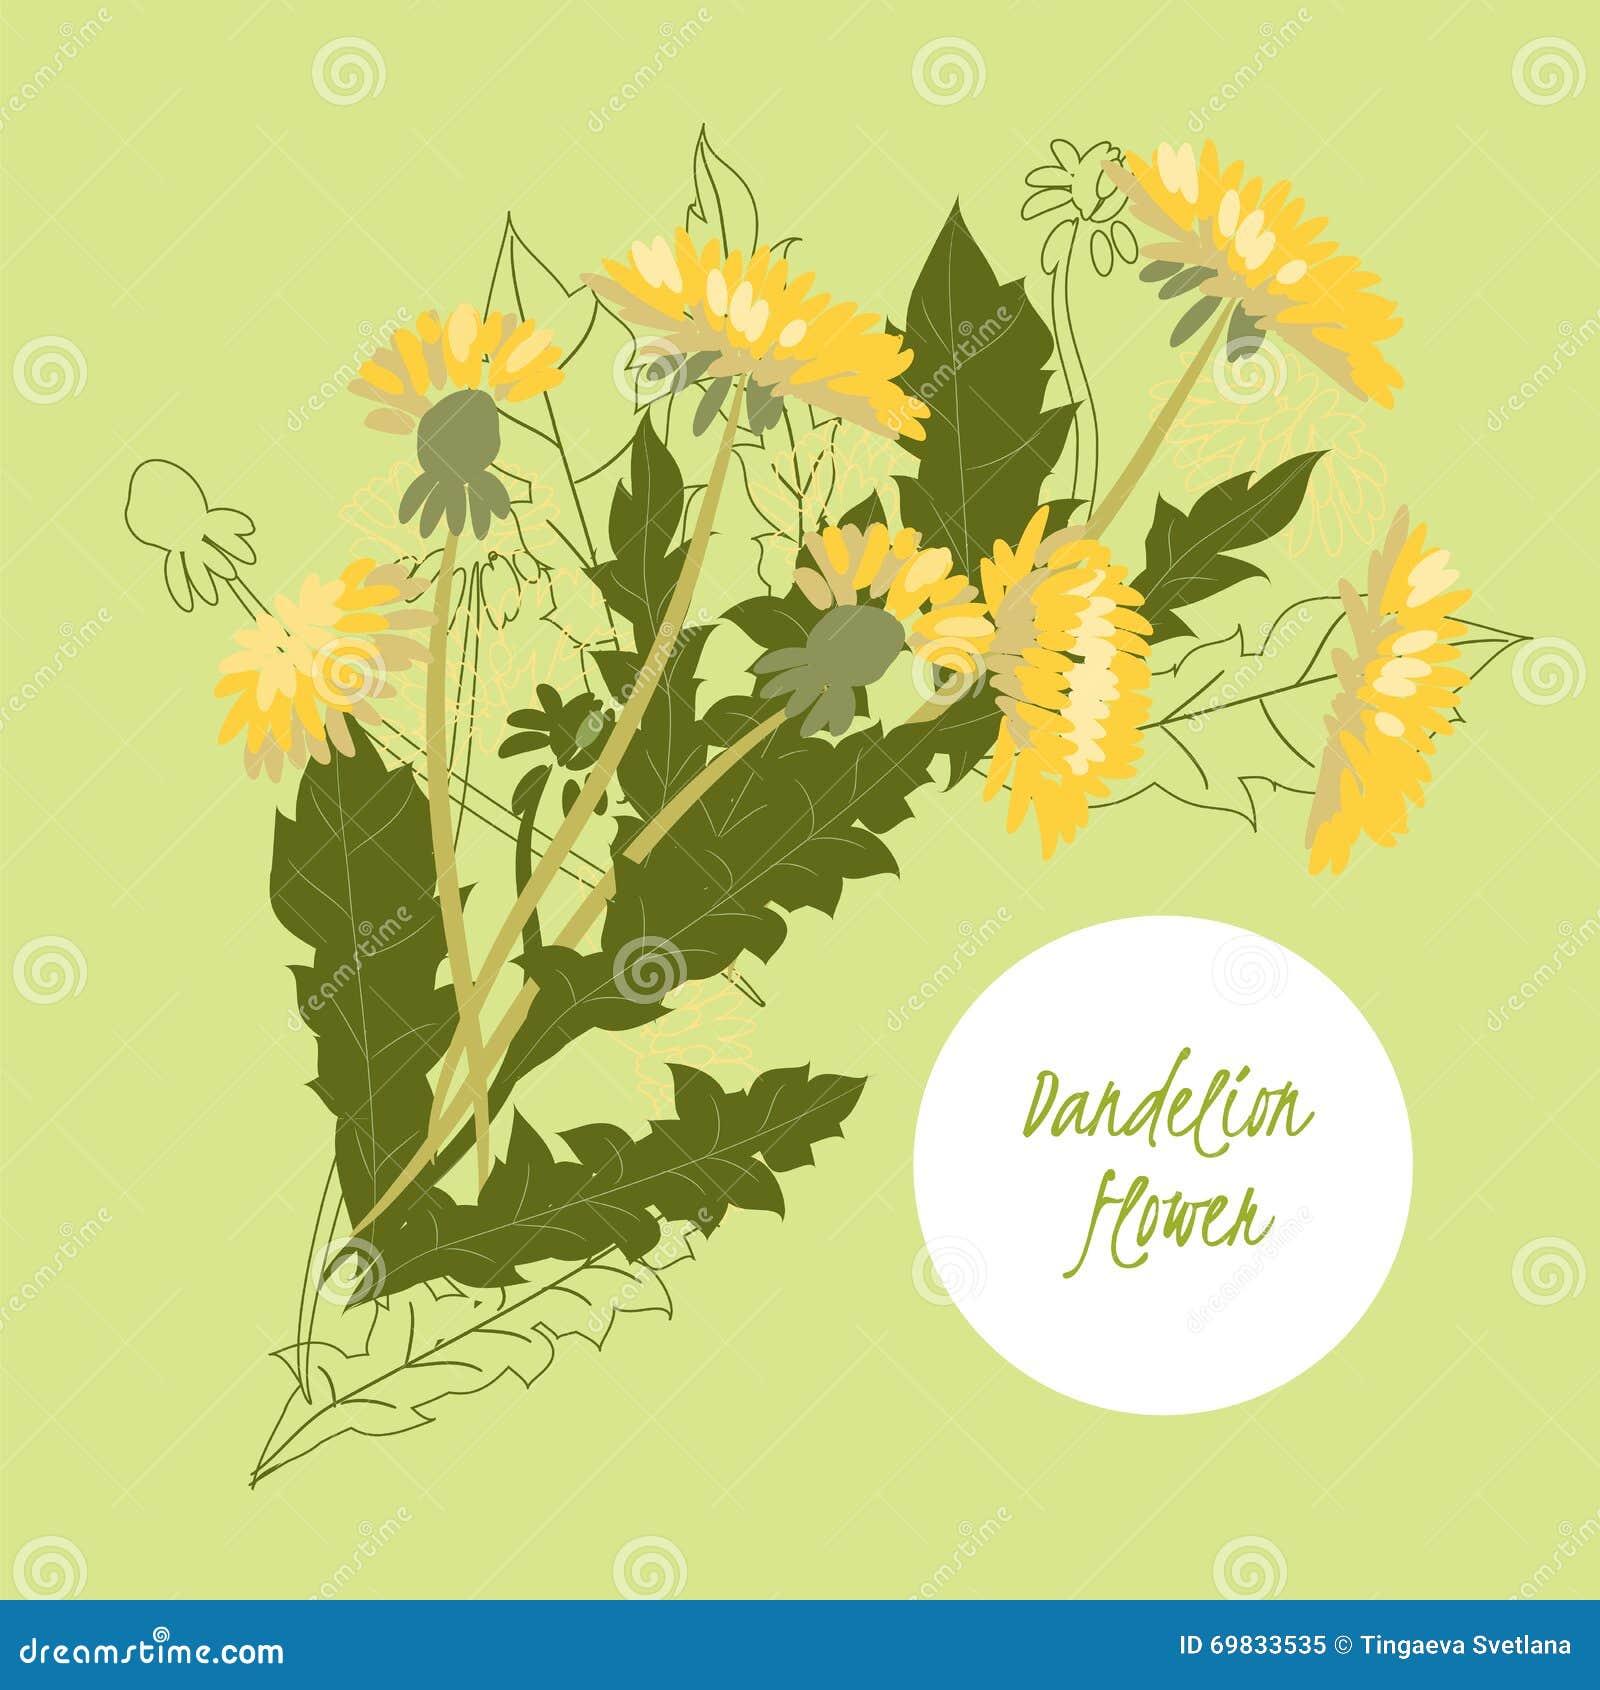 Delicate illustration Dandelion flower